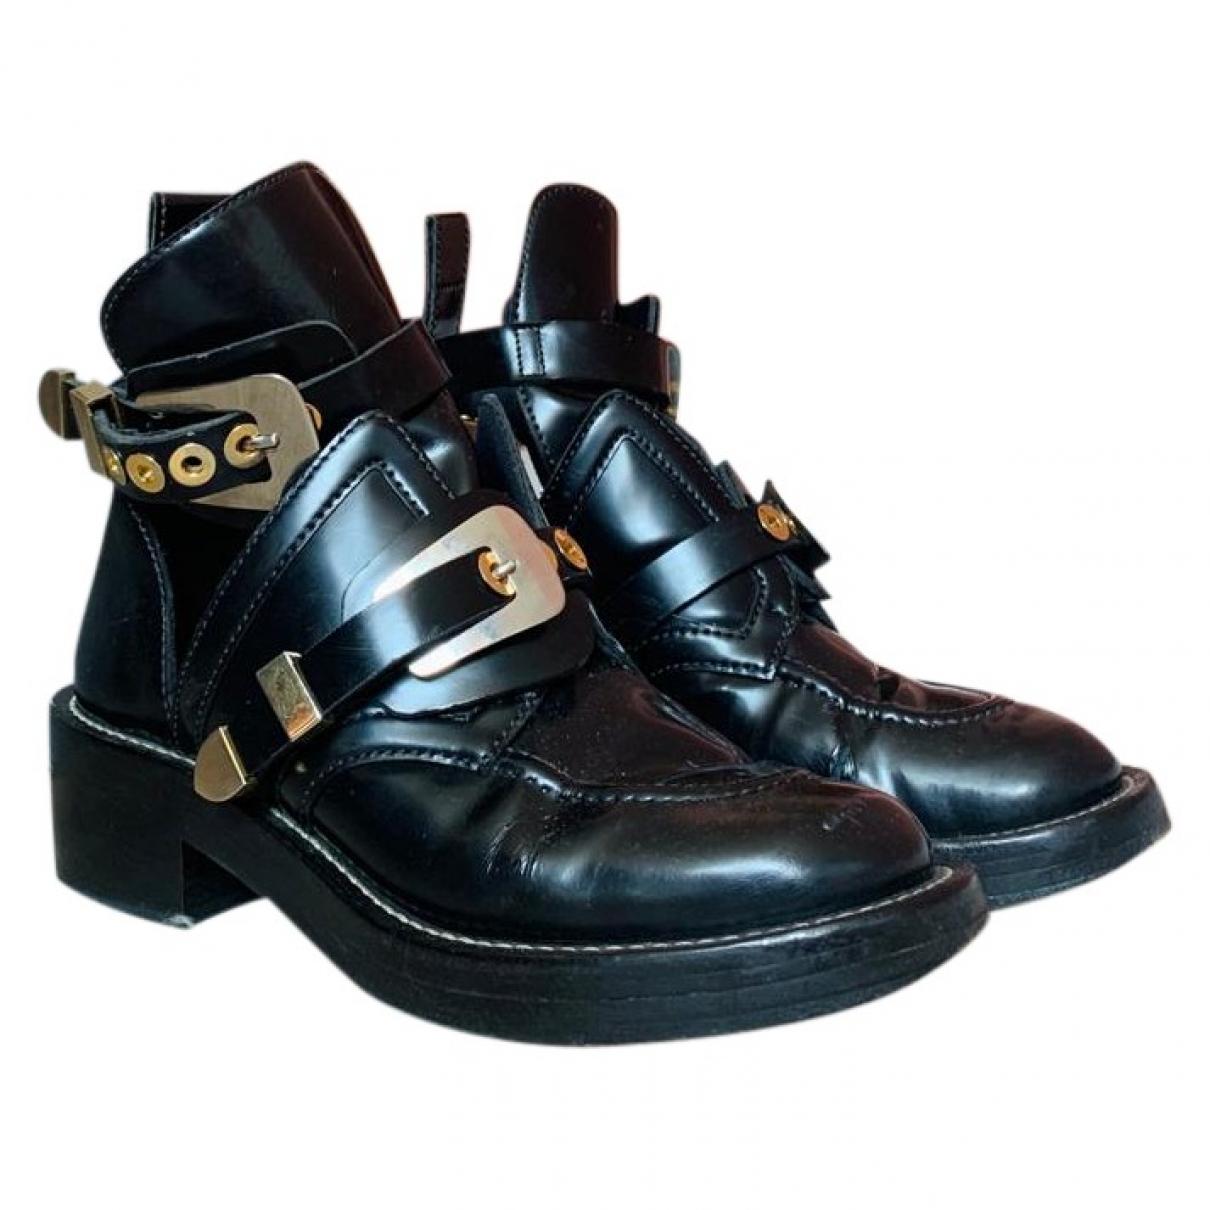 Balenciaga - Boots Ceinture pour femme en cuir - noir